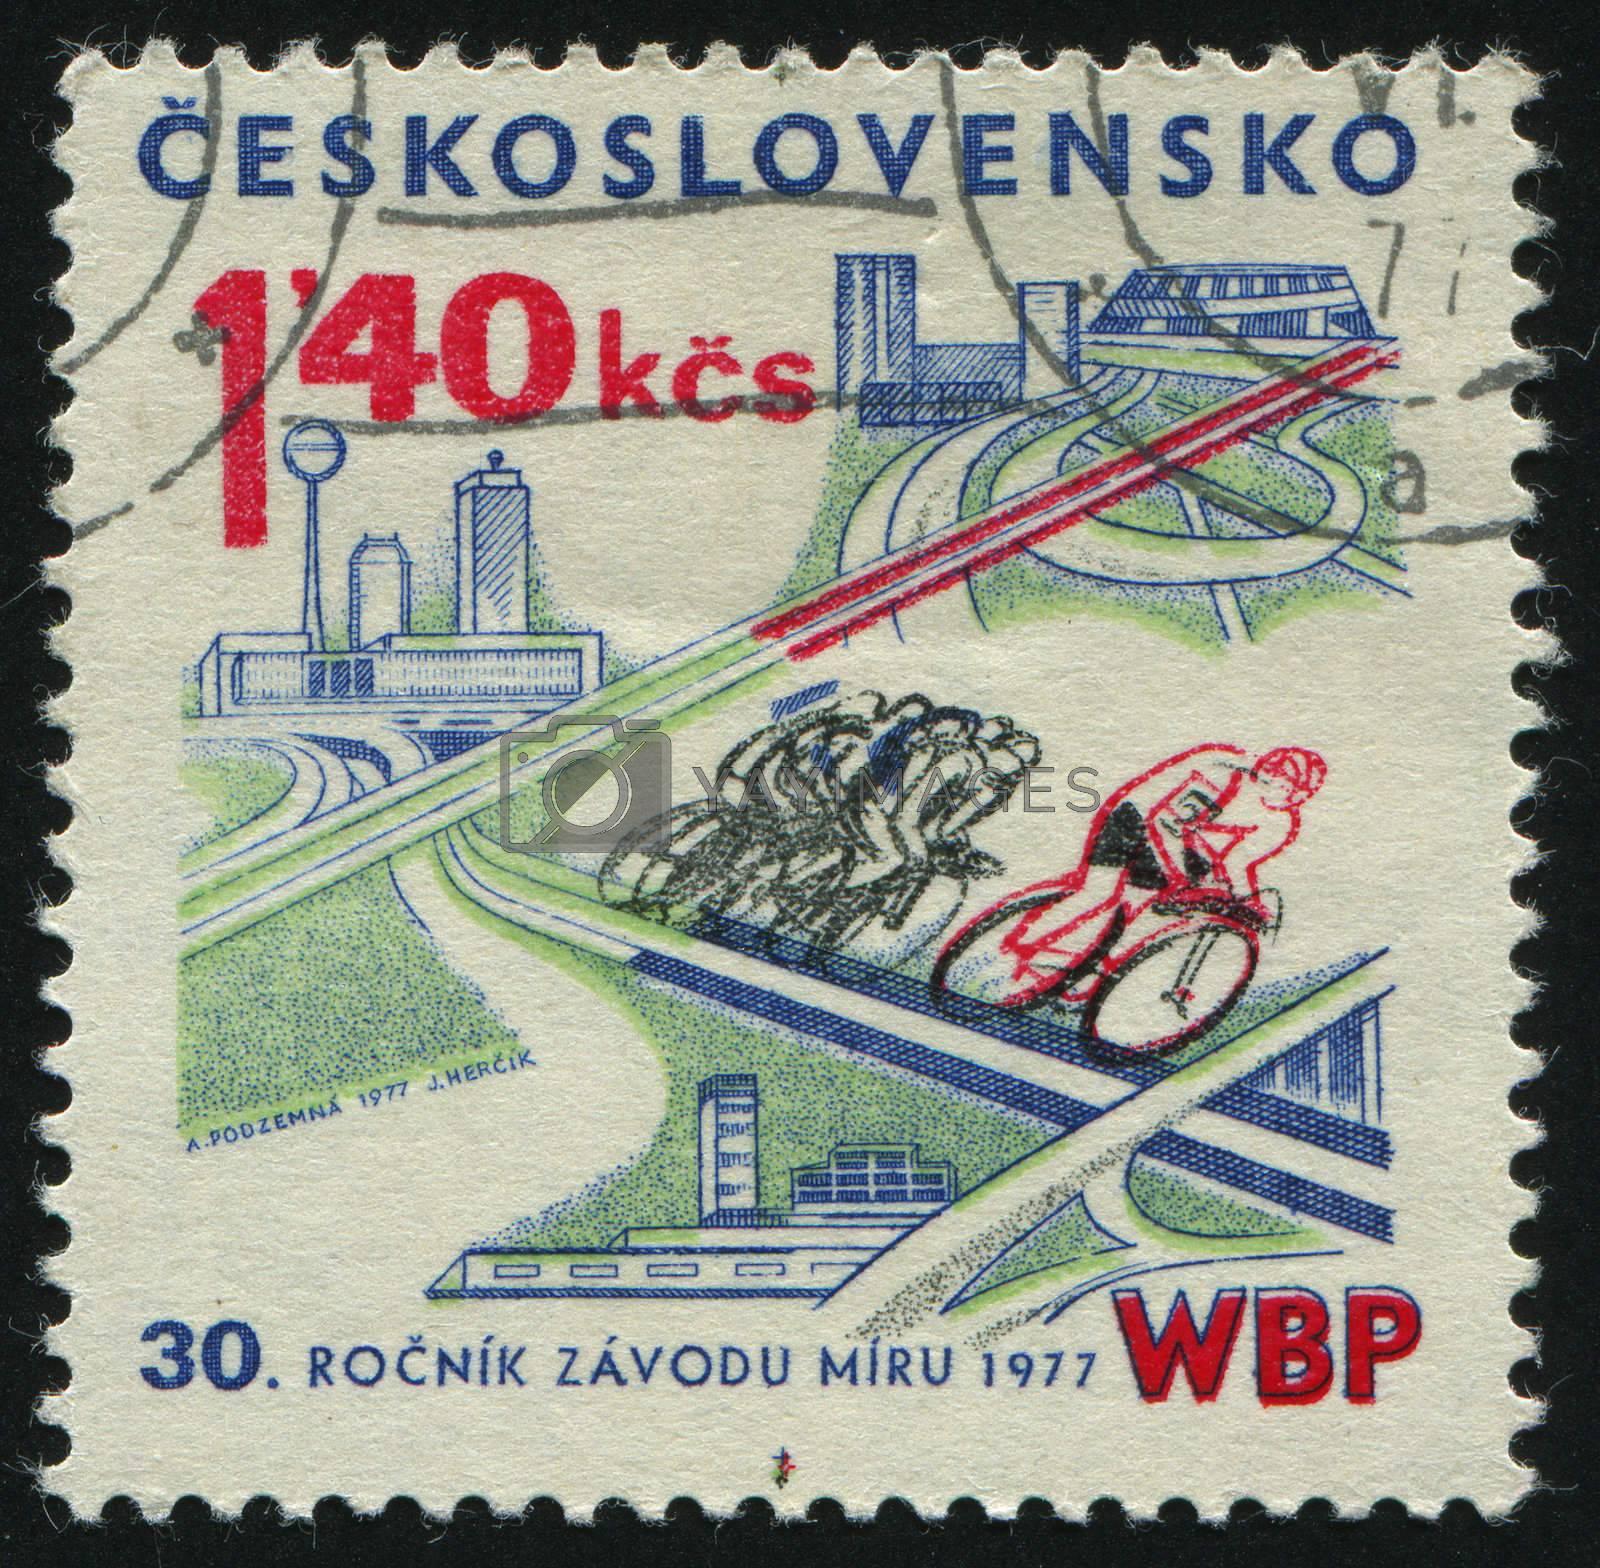 CZECHOSLOVAKIA - CIRCA 1977: Bicyclists on highways modern views of Berlin, Prague and Warsaw, circa 1977.